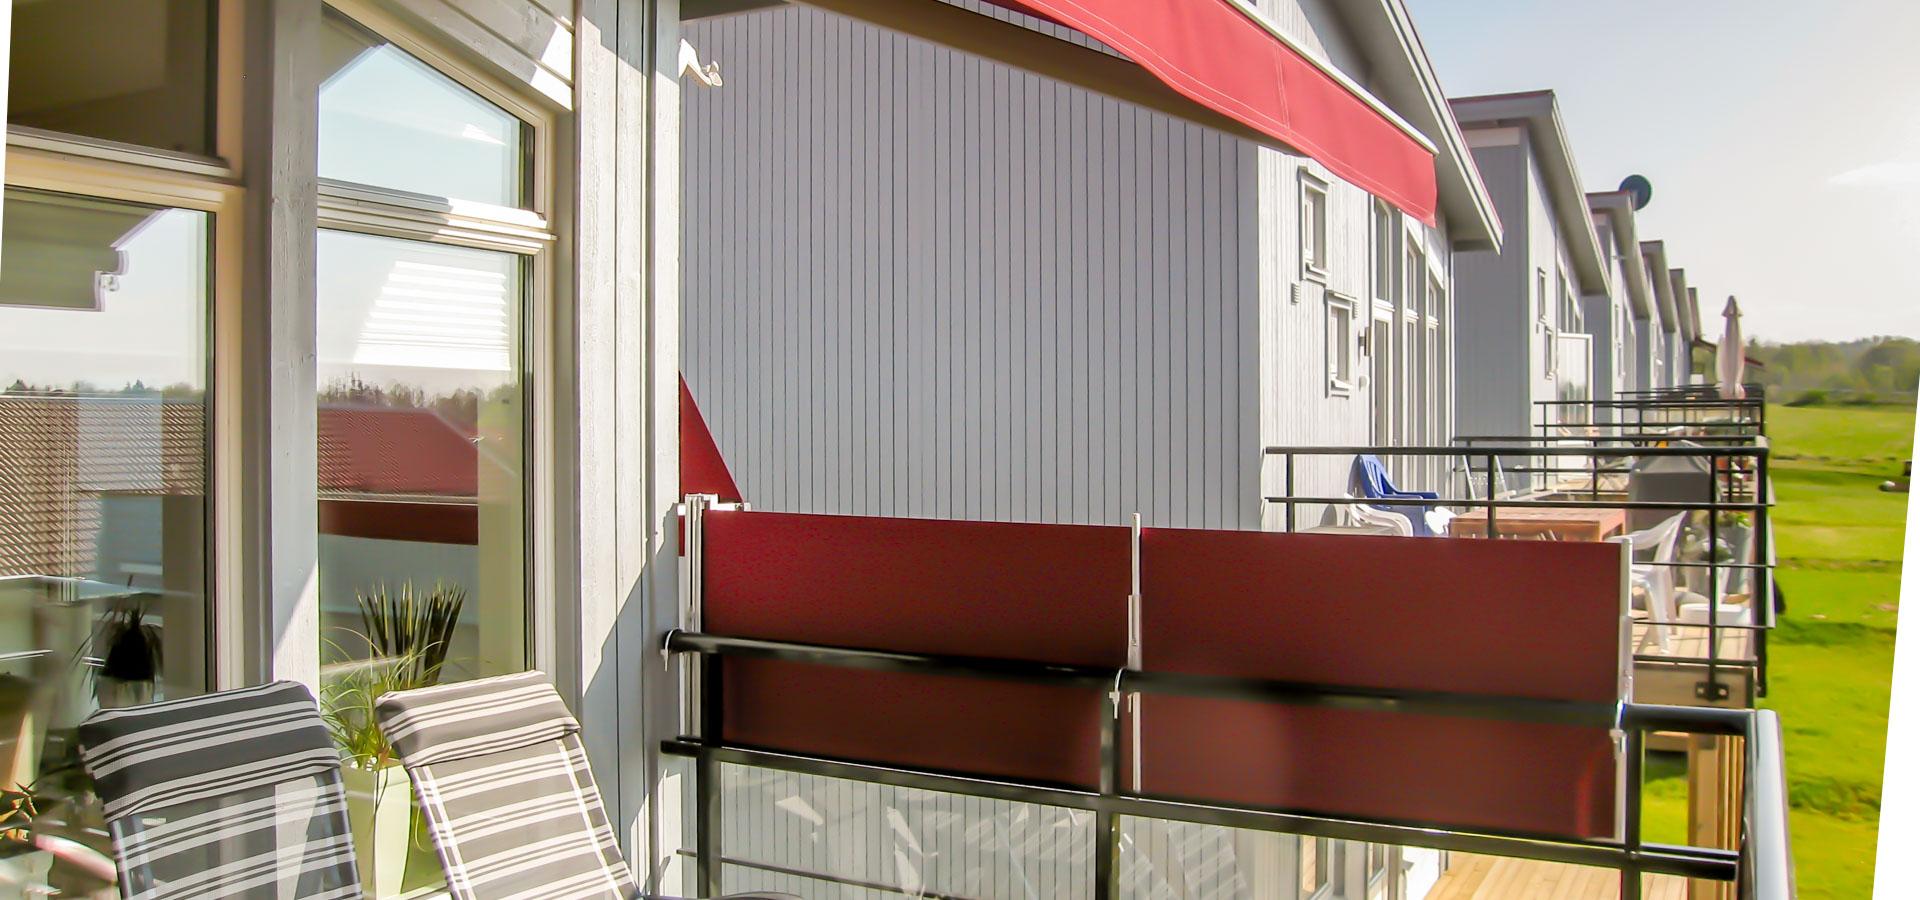 Balkongskydd, vindsksydd